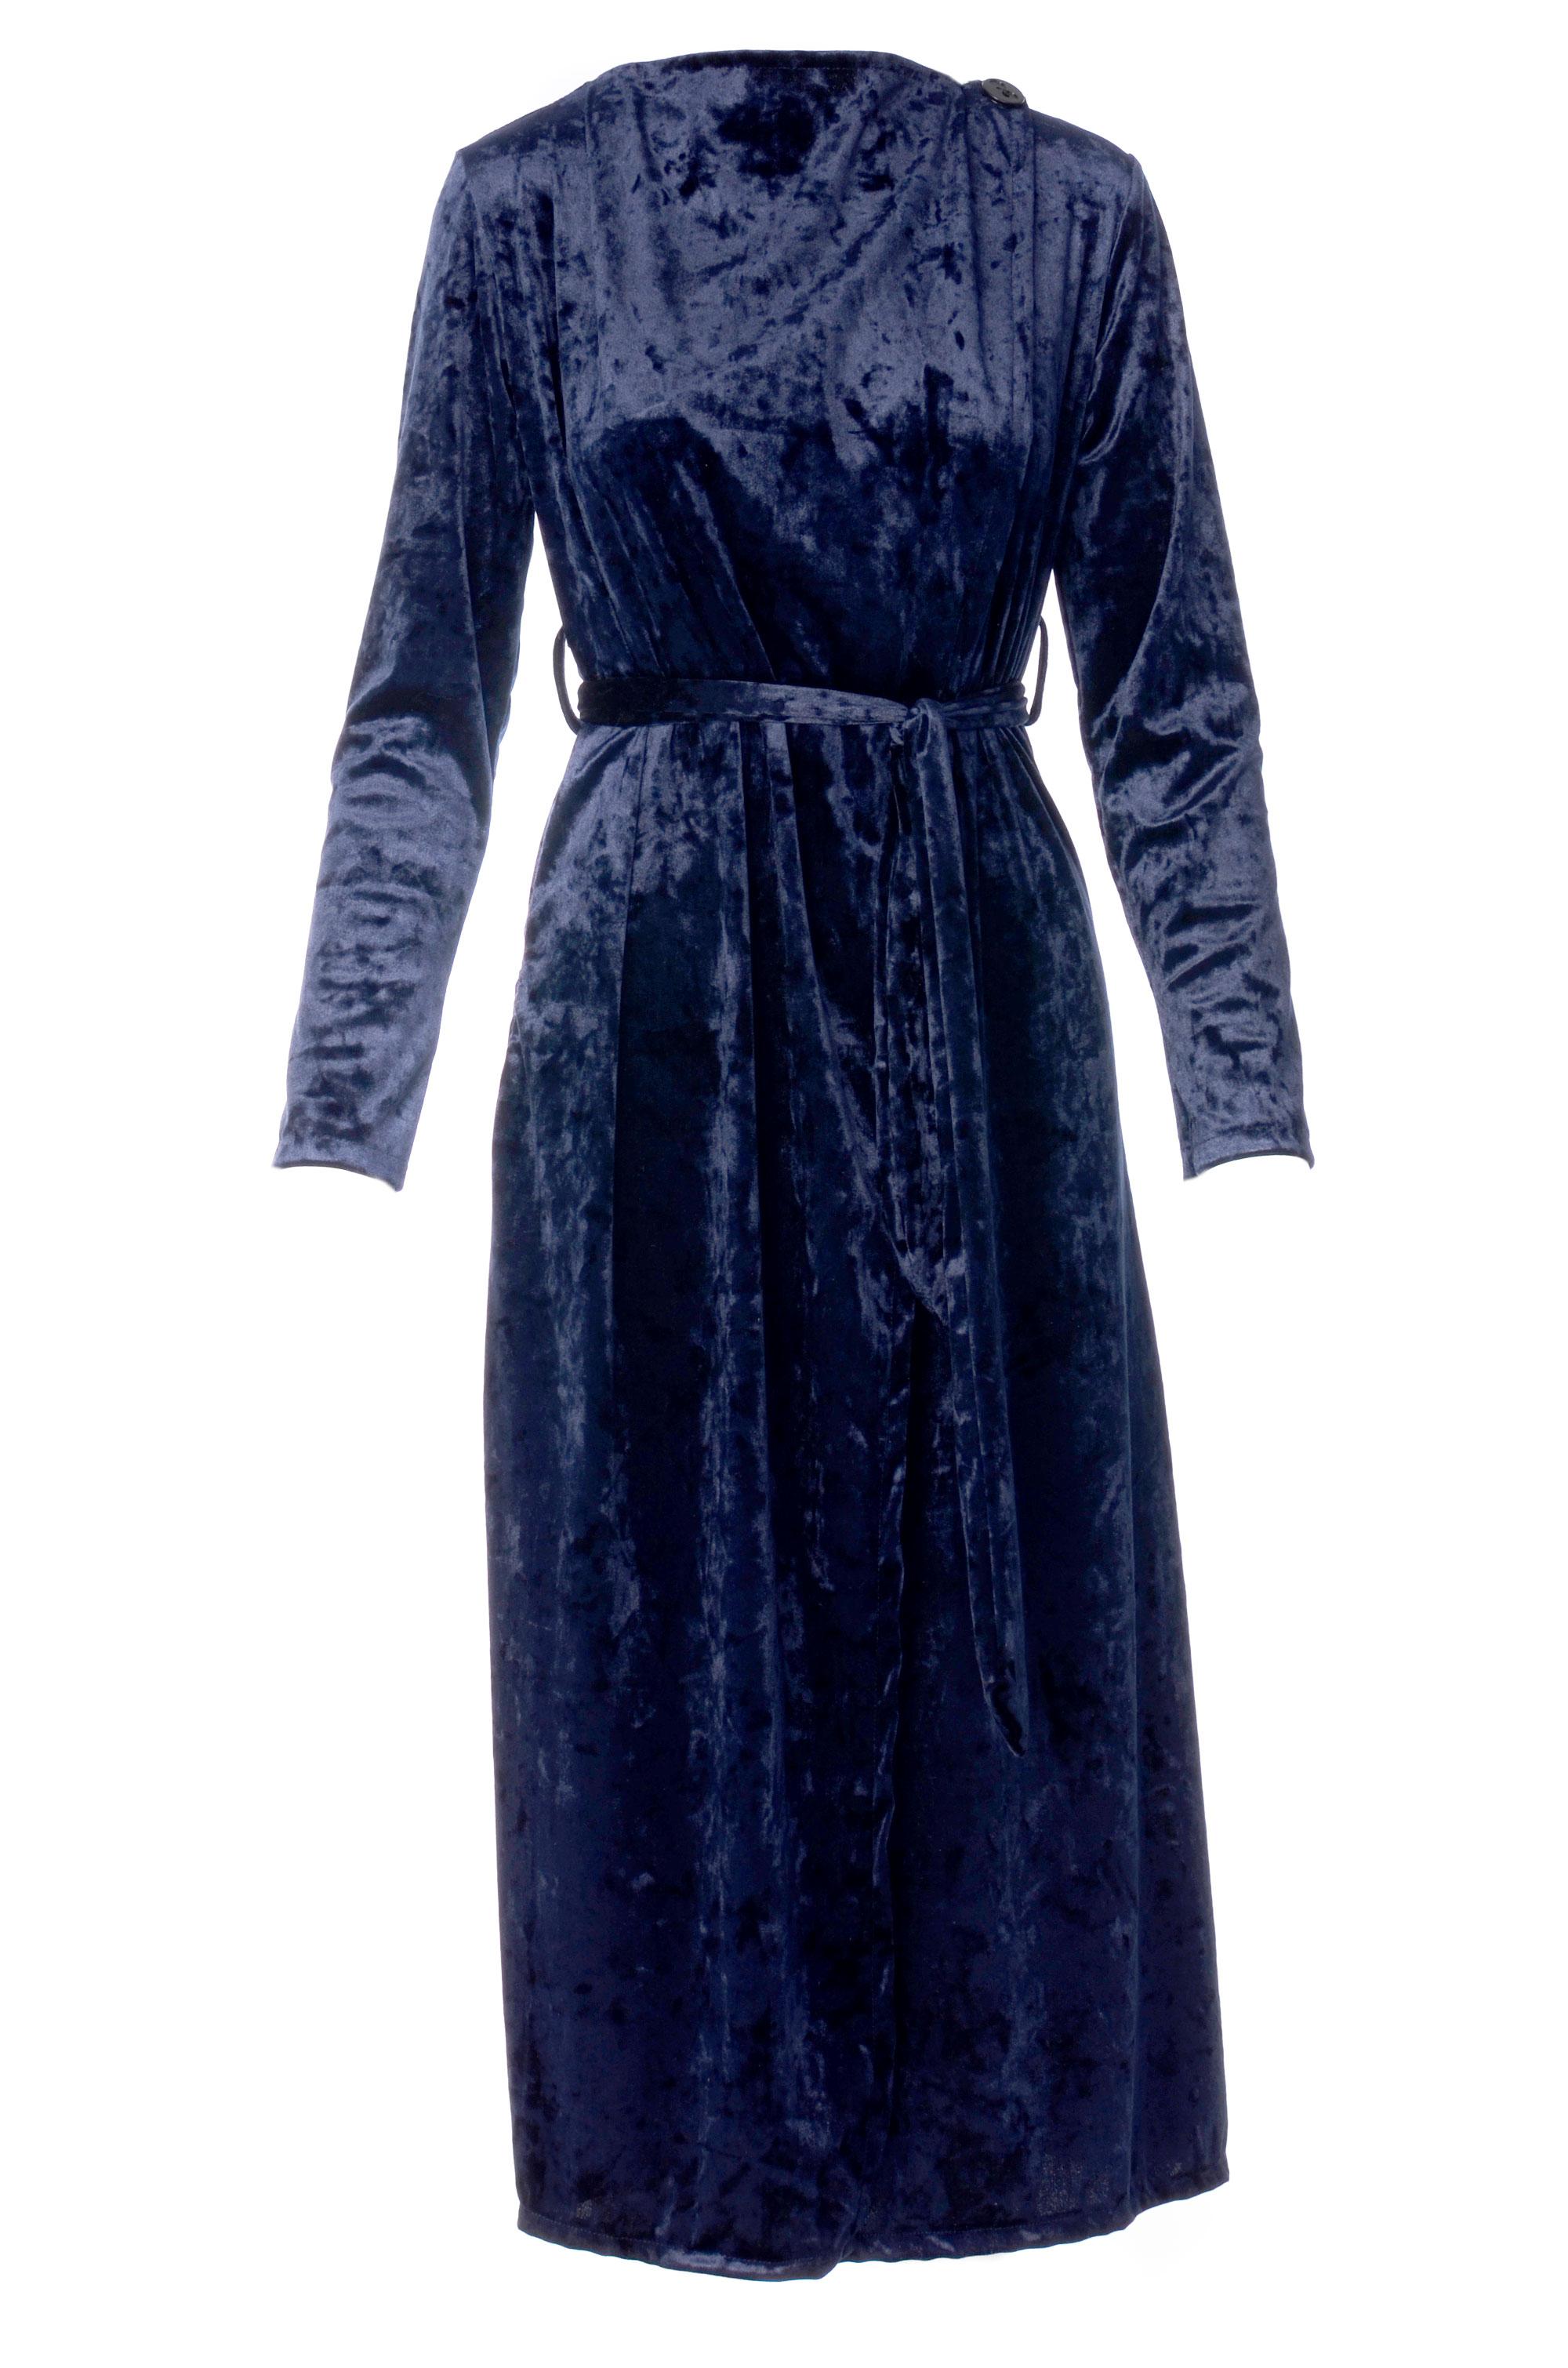 Sukienka - 16-195 BLU SC - Unisono